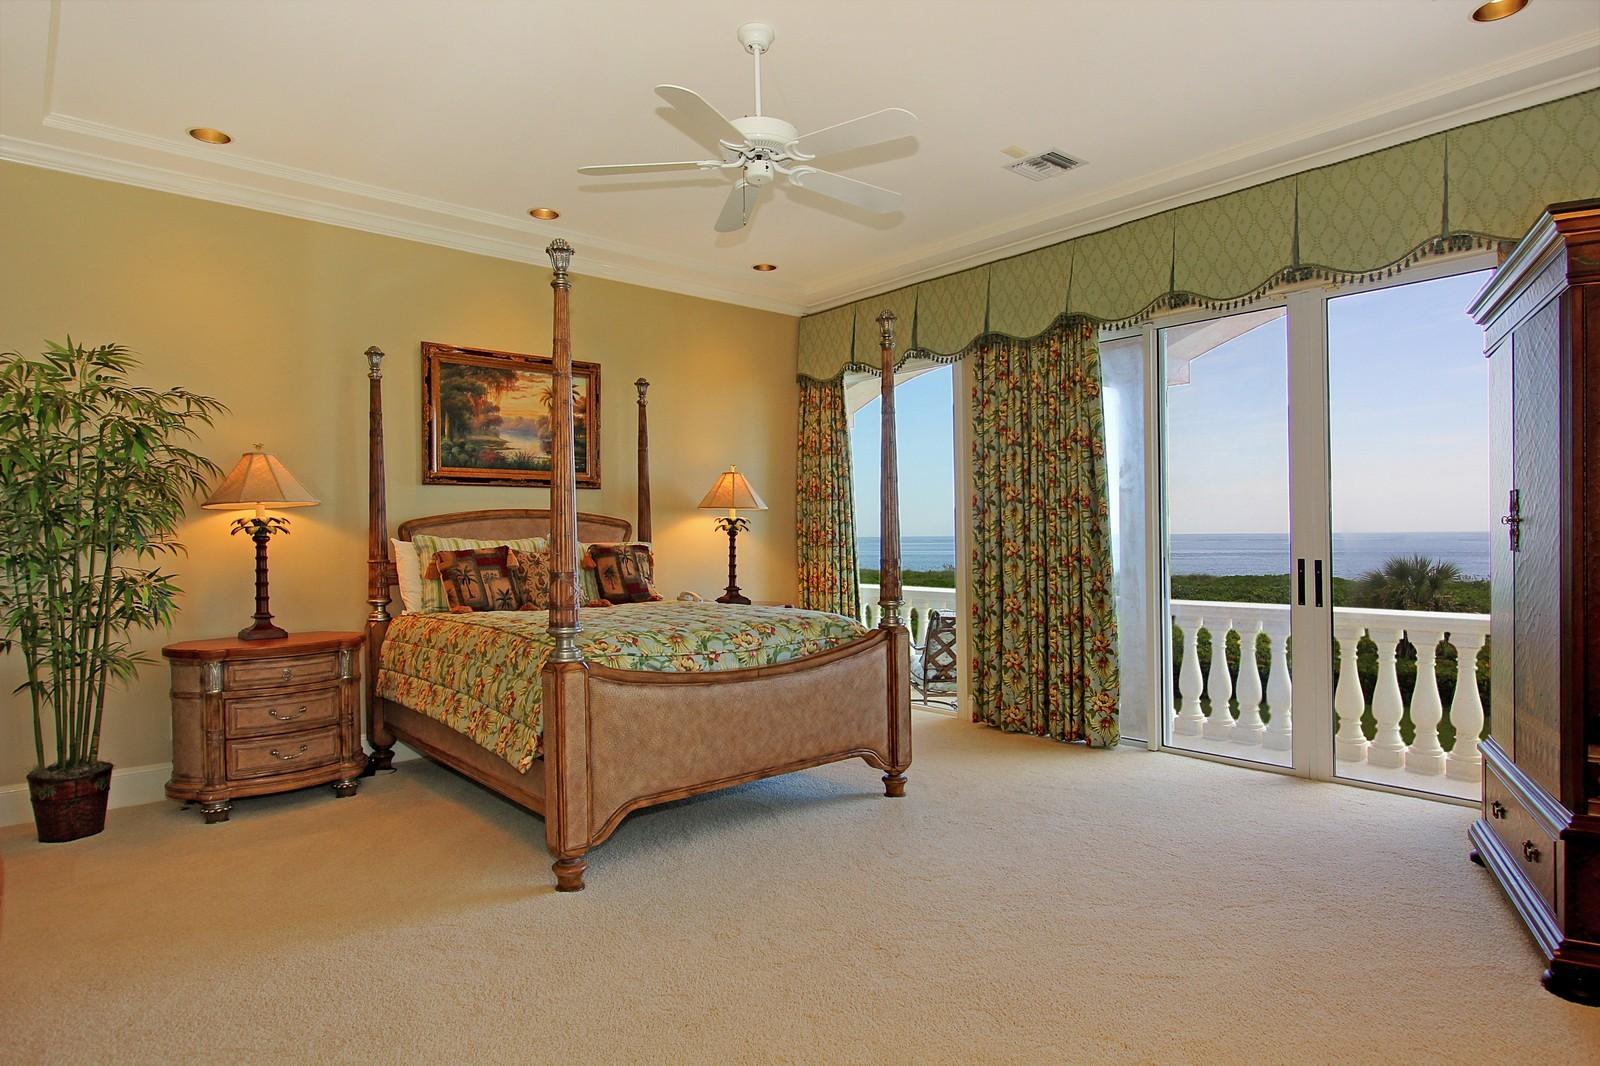 Real Estate Photography - 3047 SE Island Point Lane, Stuart, FL, 34996 - Guest House Bedroom 1 of 4